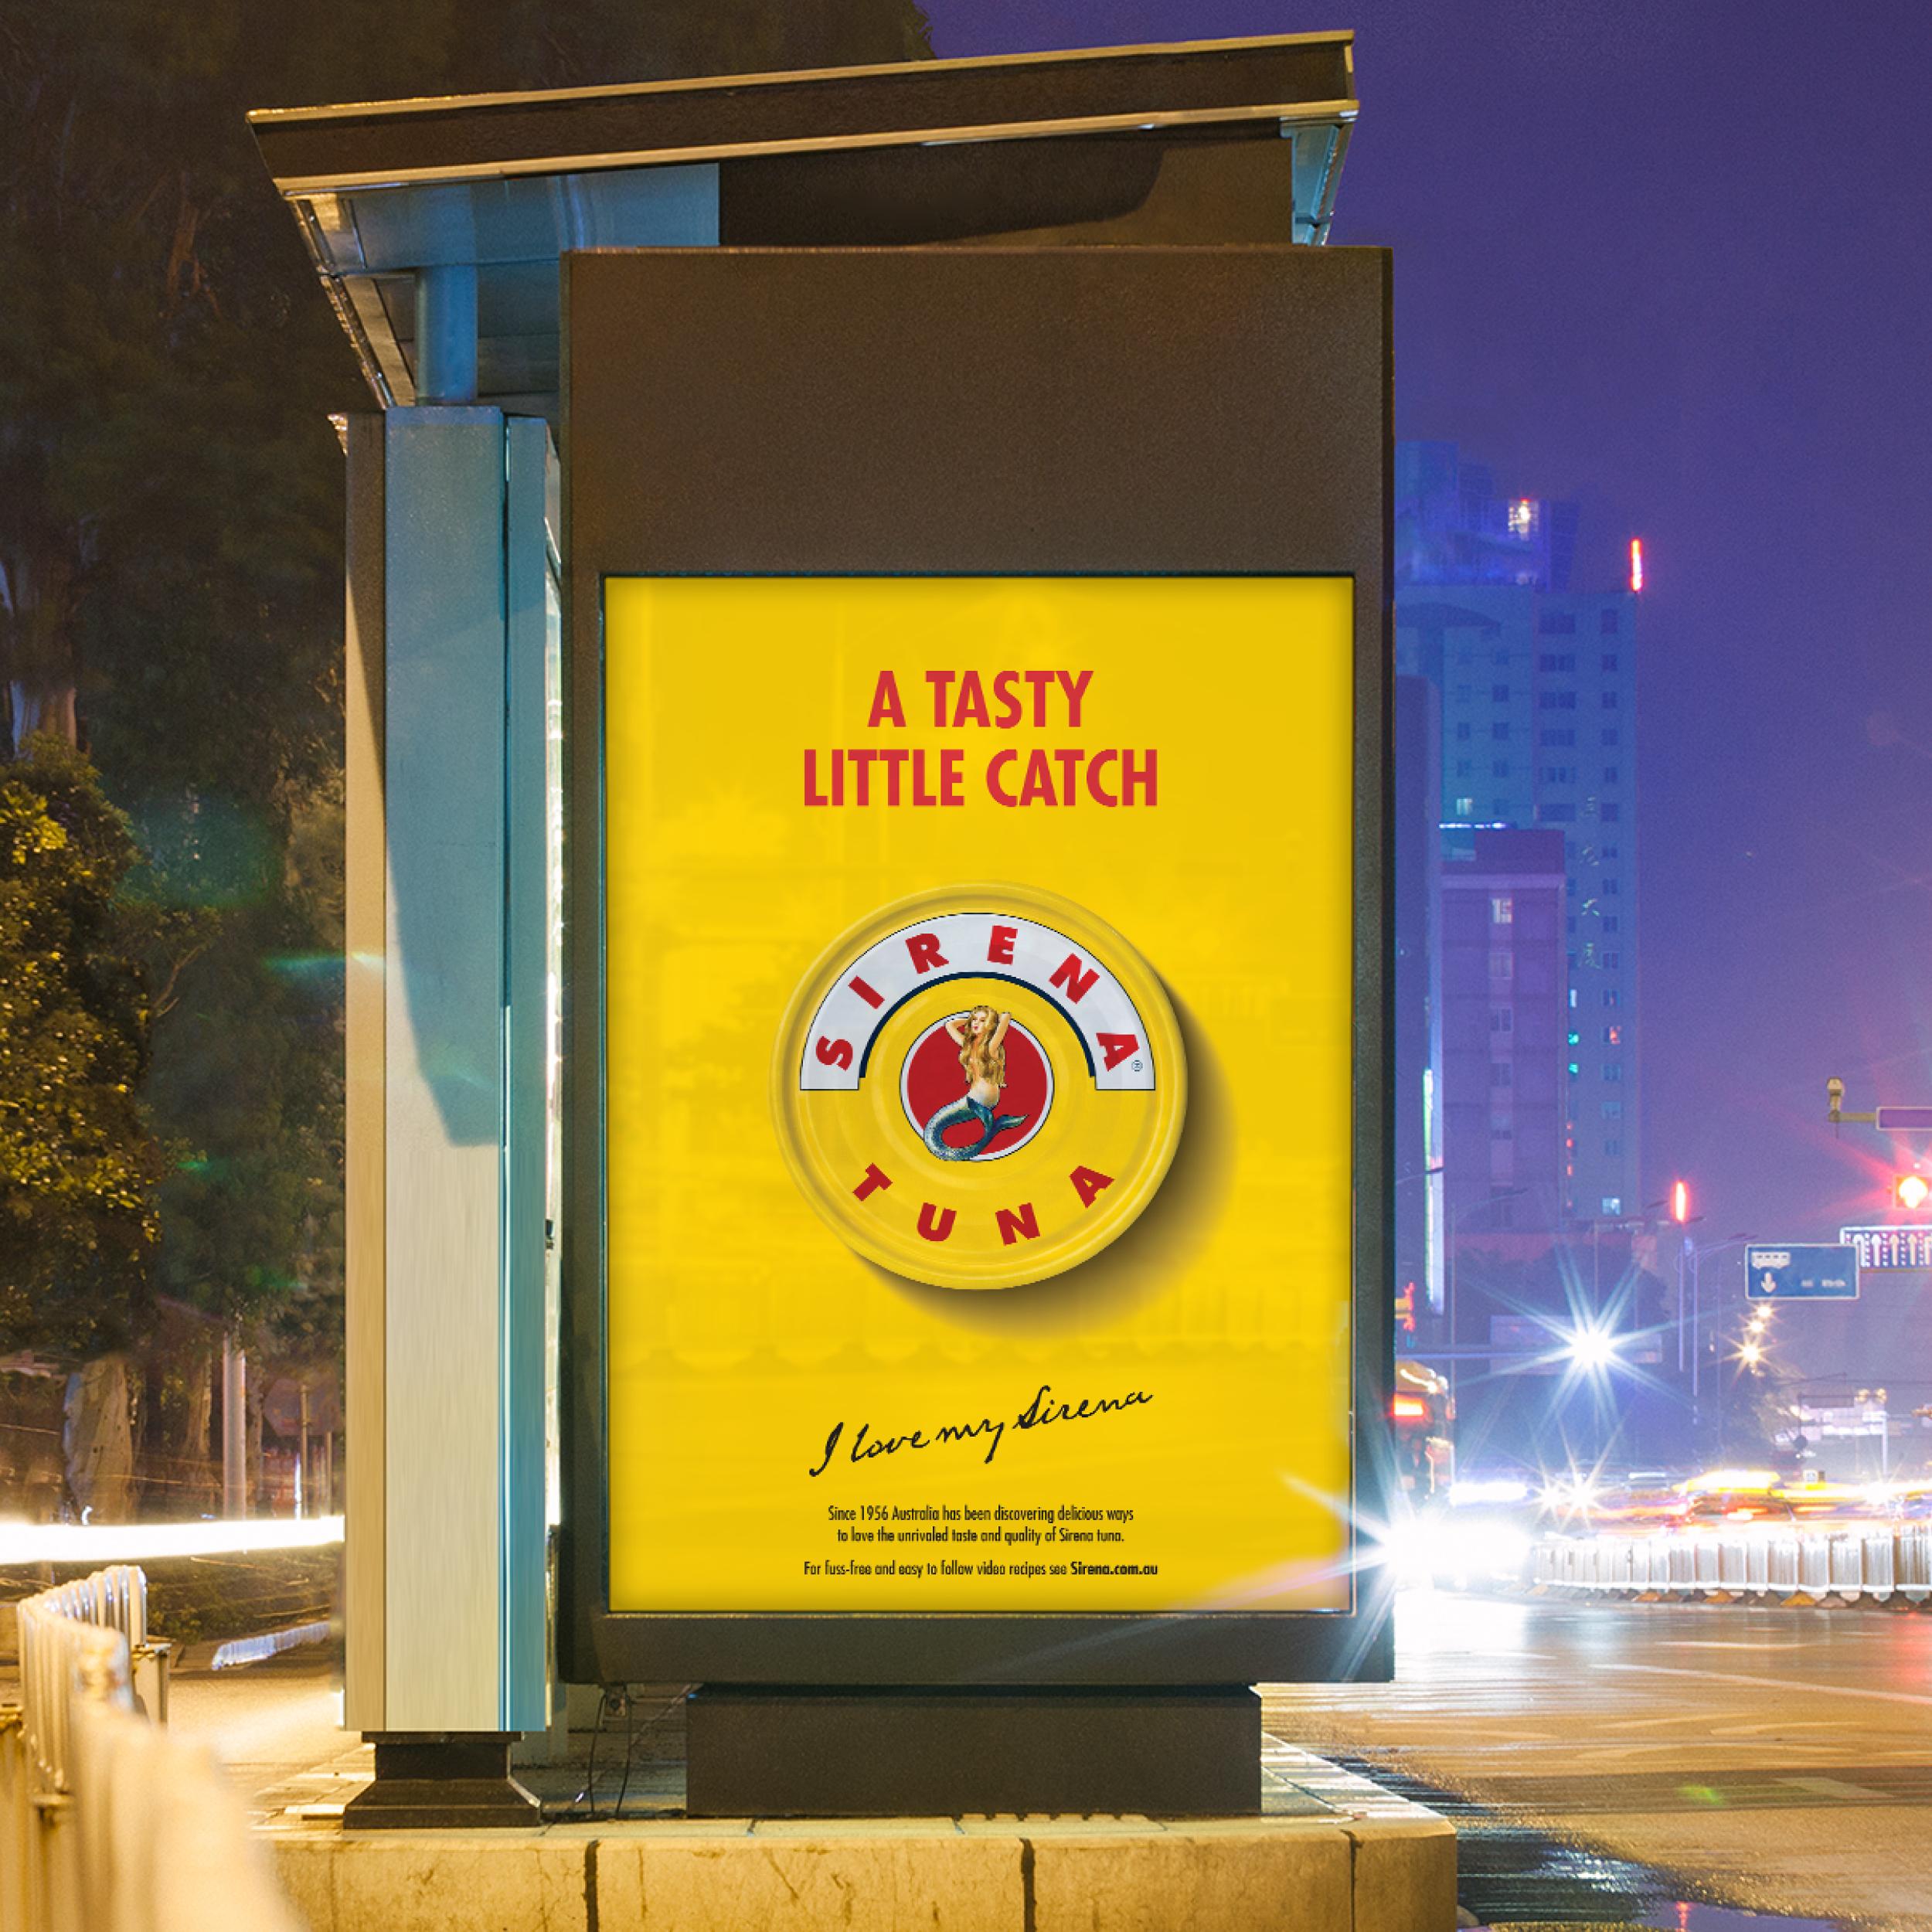 2018-marketing-advertising-2500x2500px-18.jpg